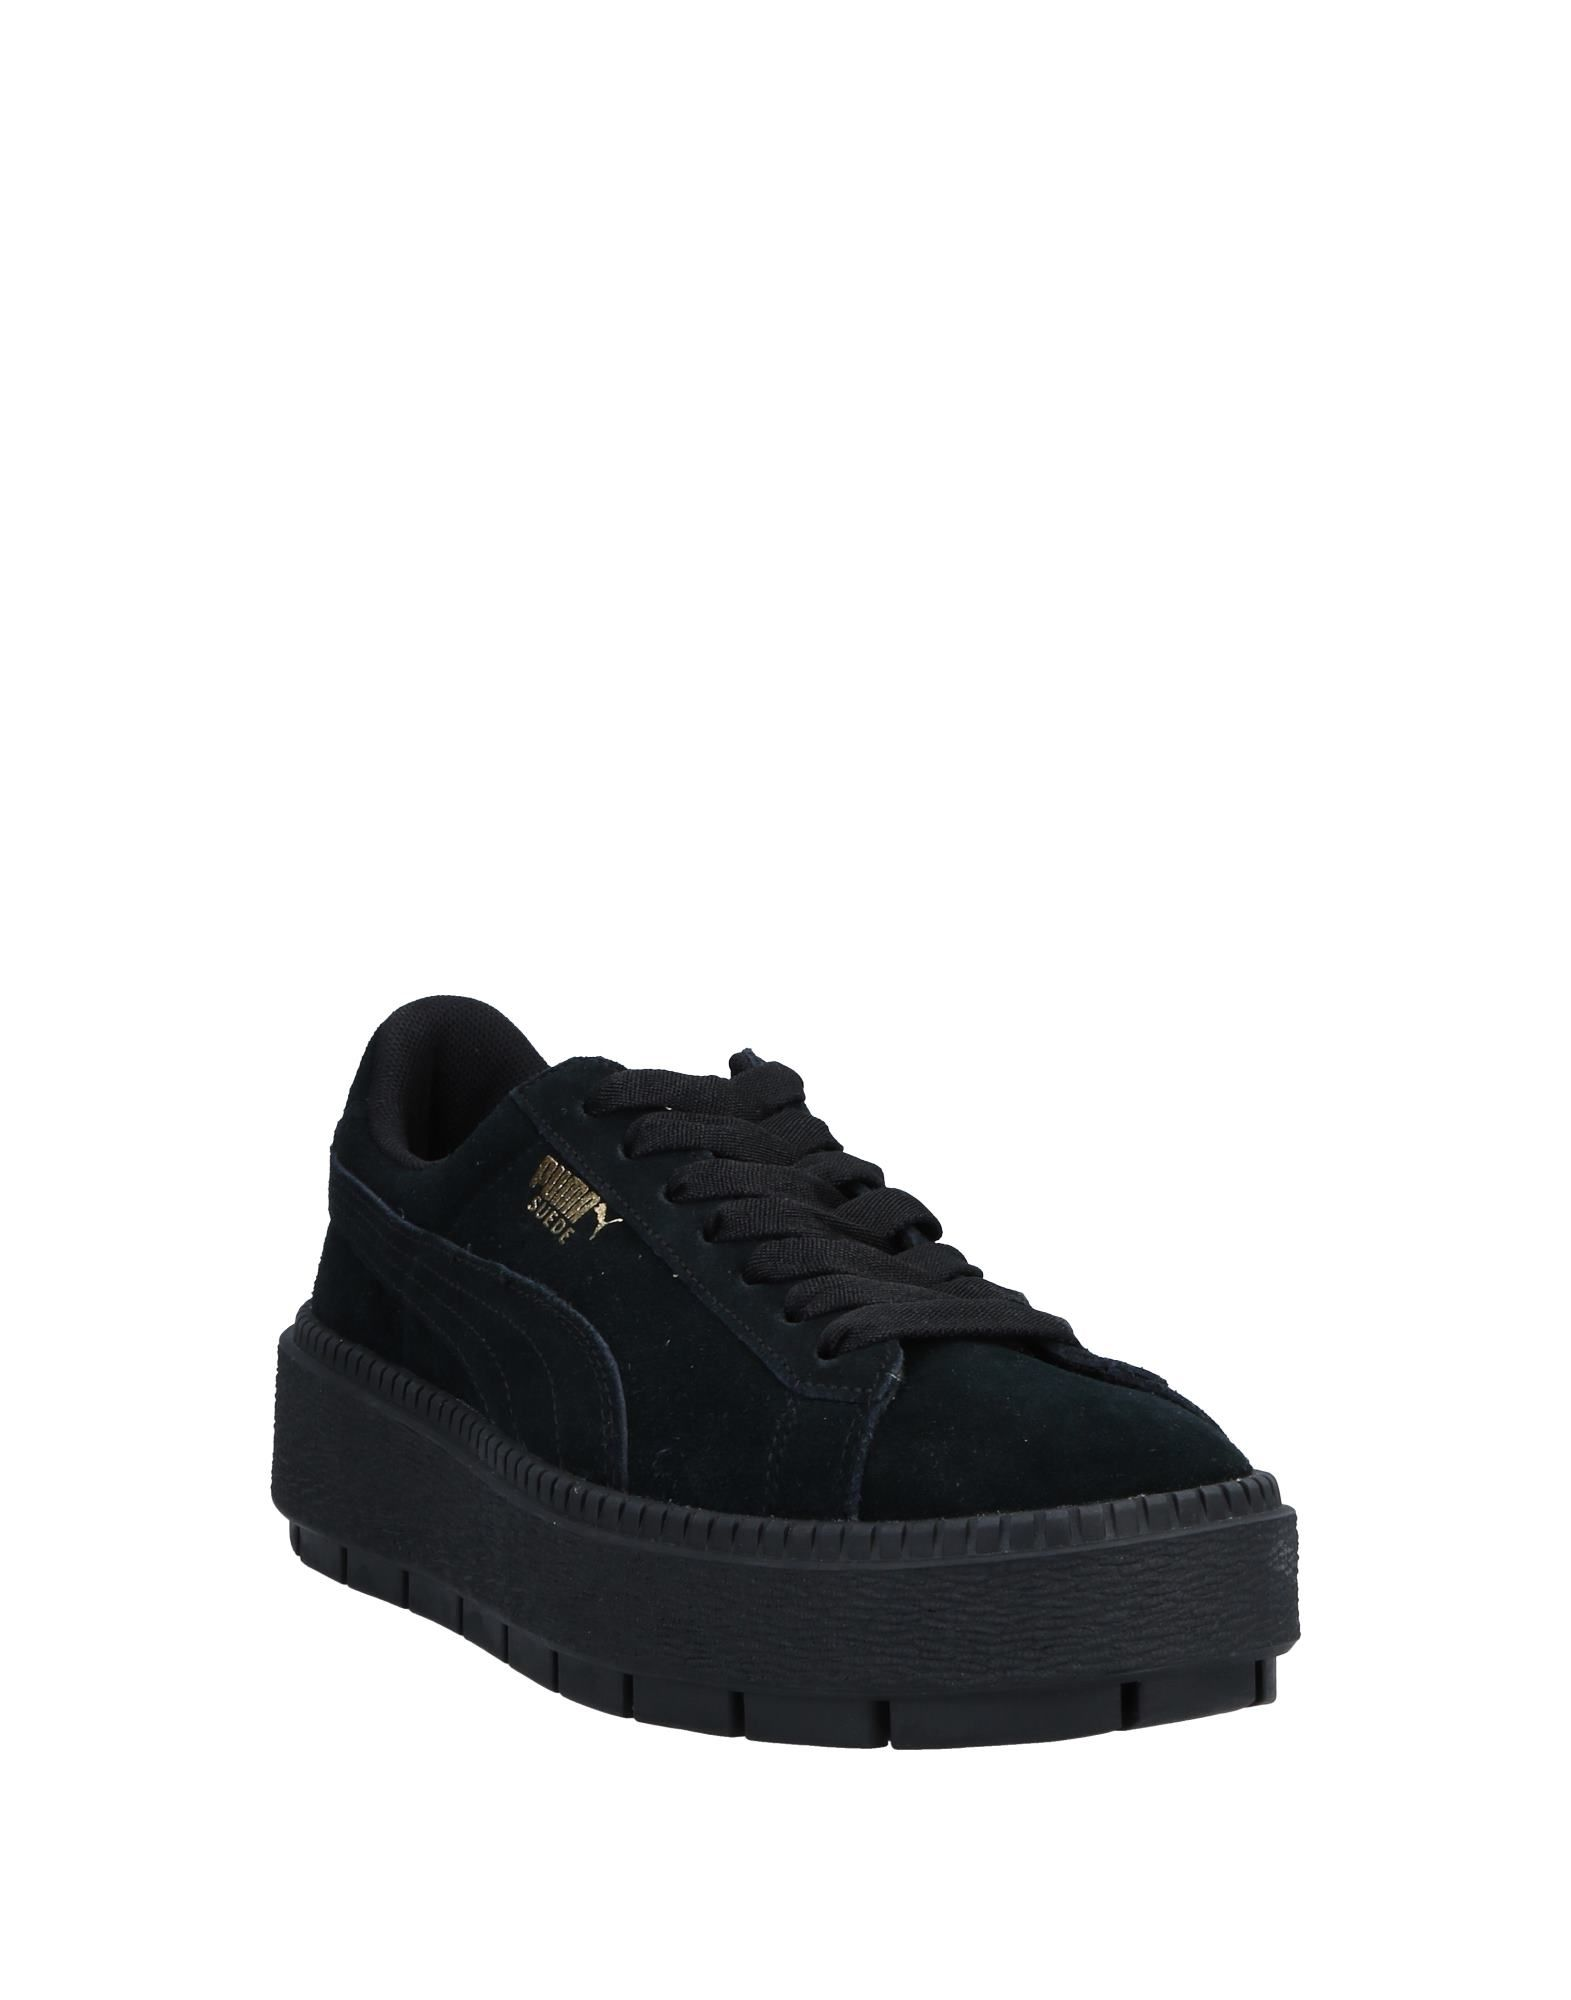 Puma Sneakers Damen  beliebte 11559266IO Gute Qualität beliebte  Schuhe b0b19f